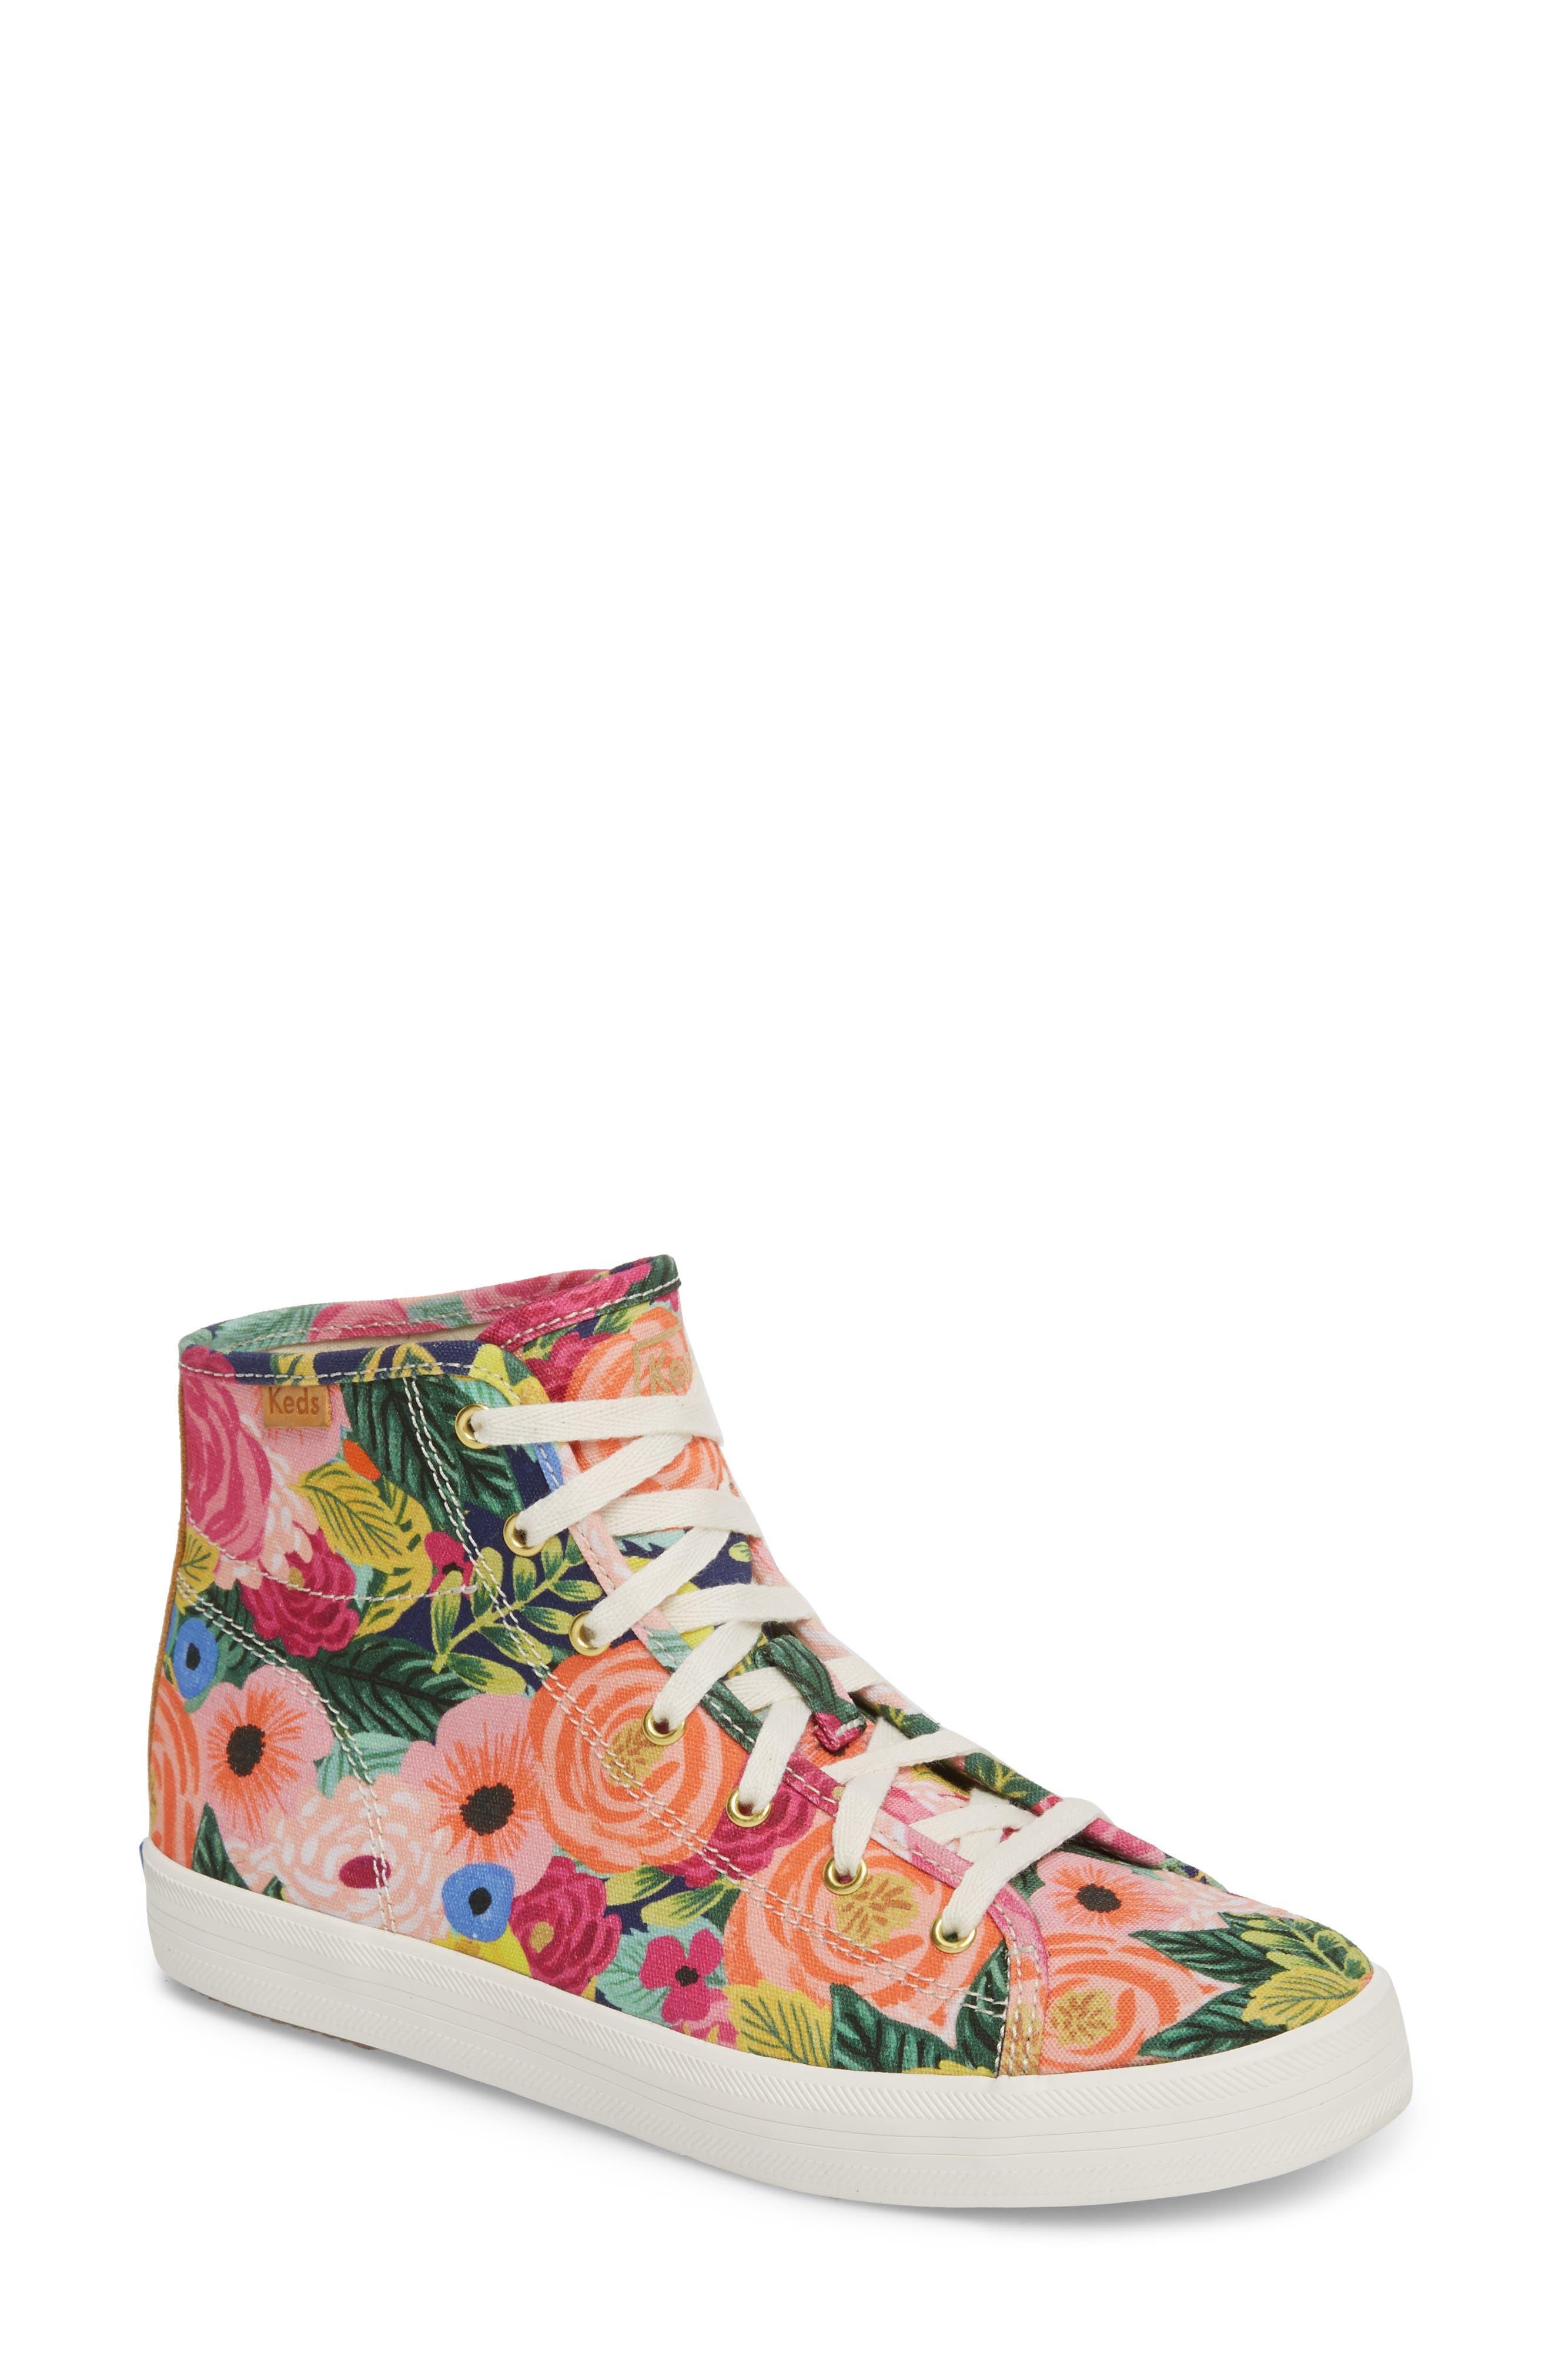 x Rifle Paper Co. Kickstart Julie High Top Sneaker,                         Main,                         color, Pink Multi